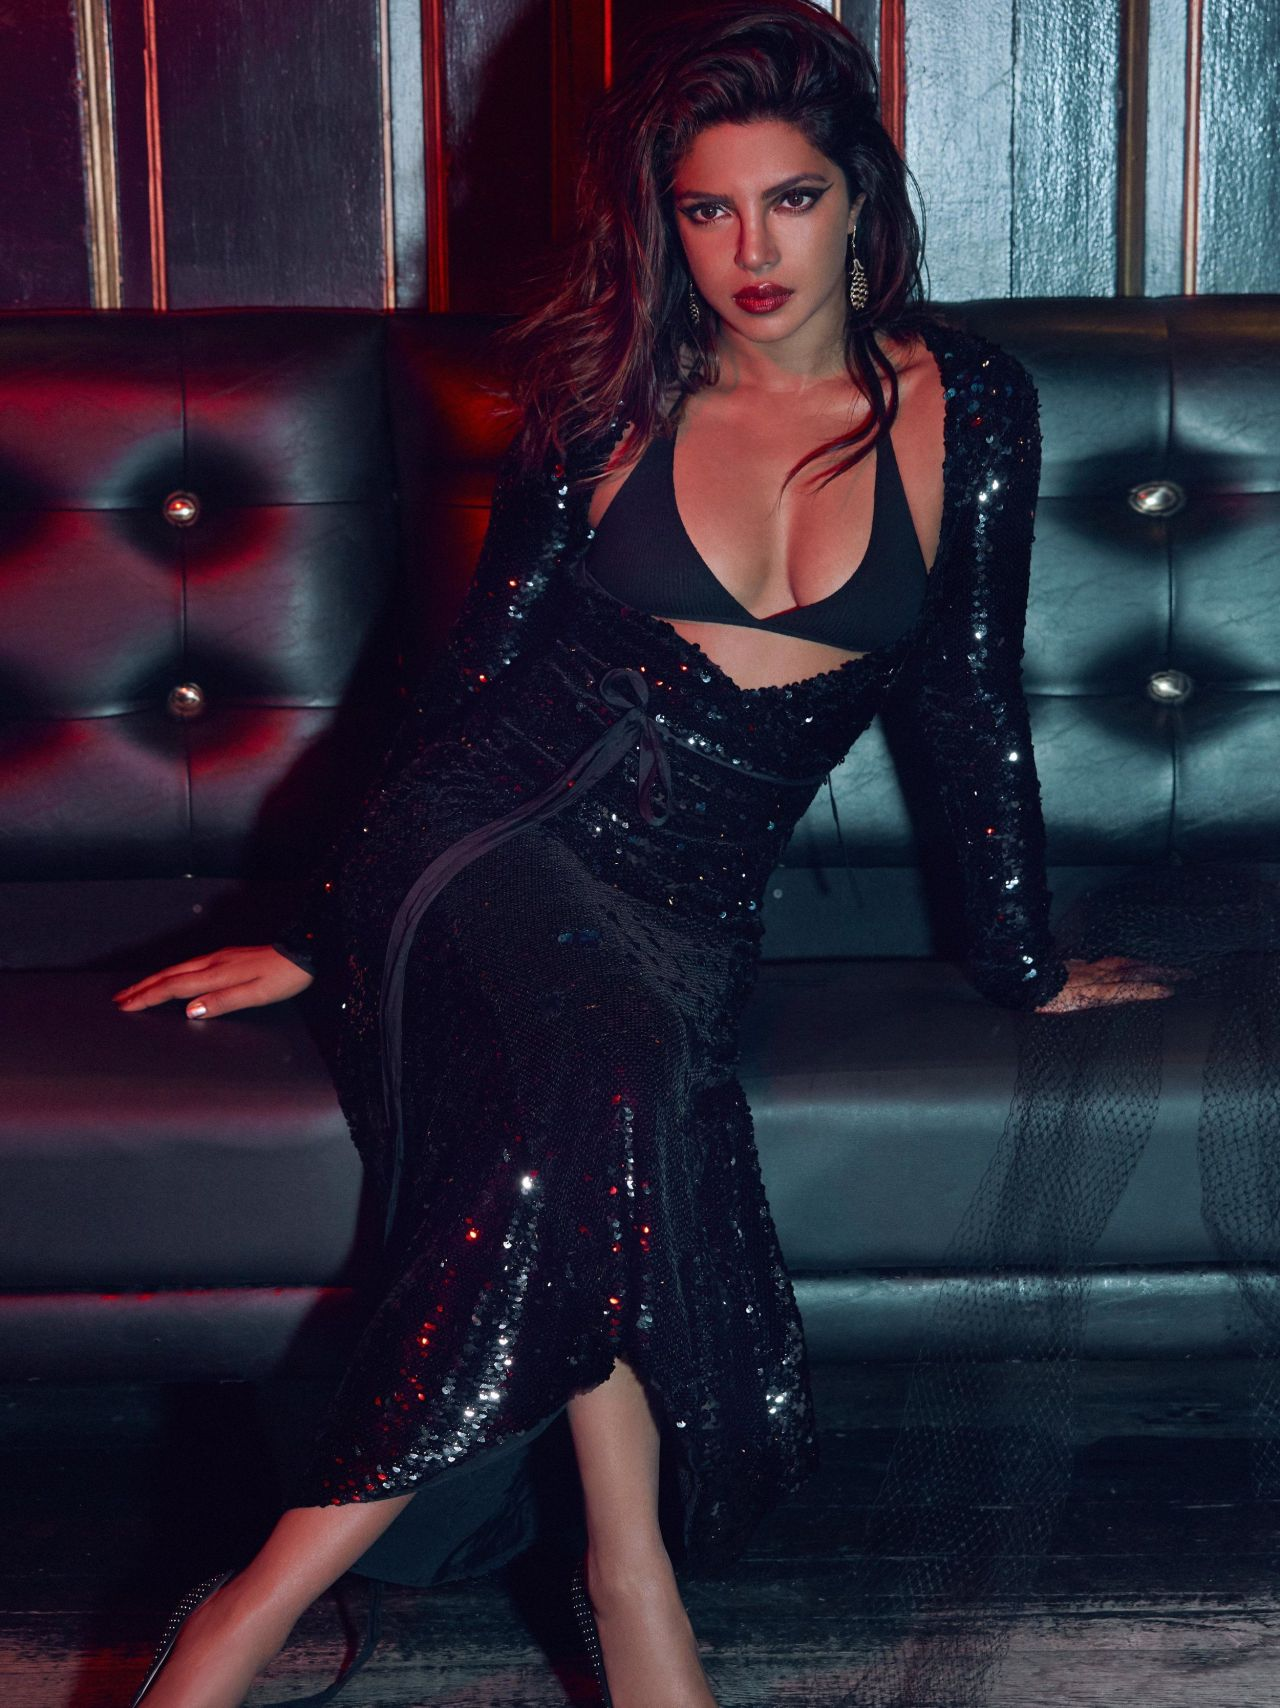 Priyanka Chopra - Vogue India, September 2017 Issue And Photos-7987